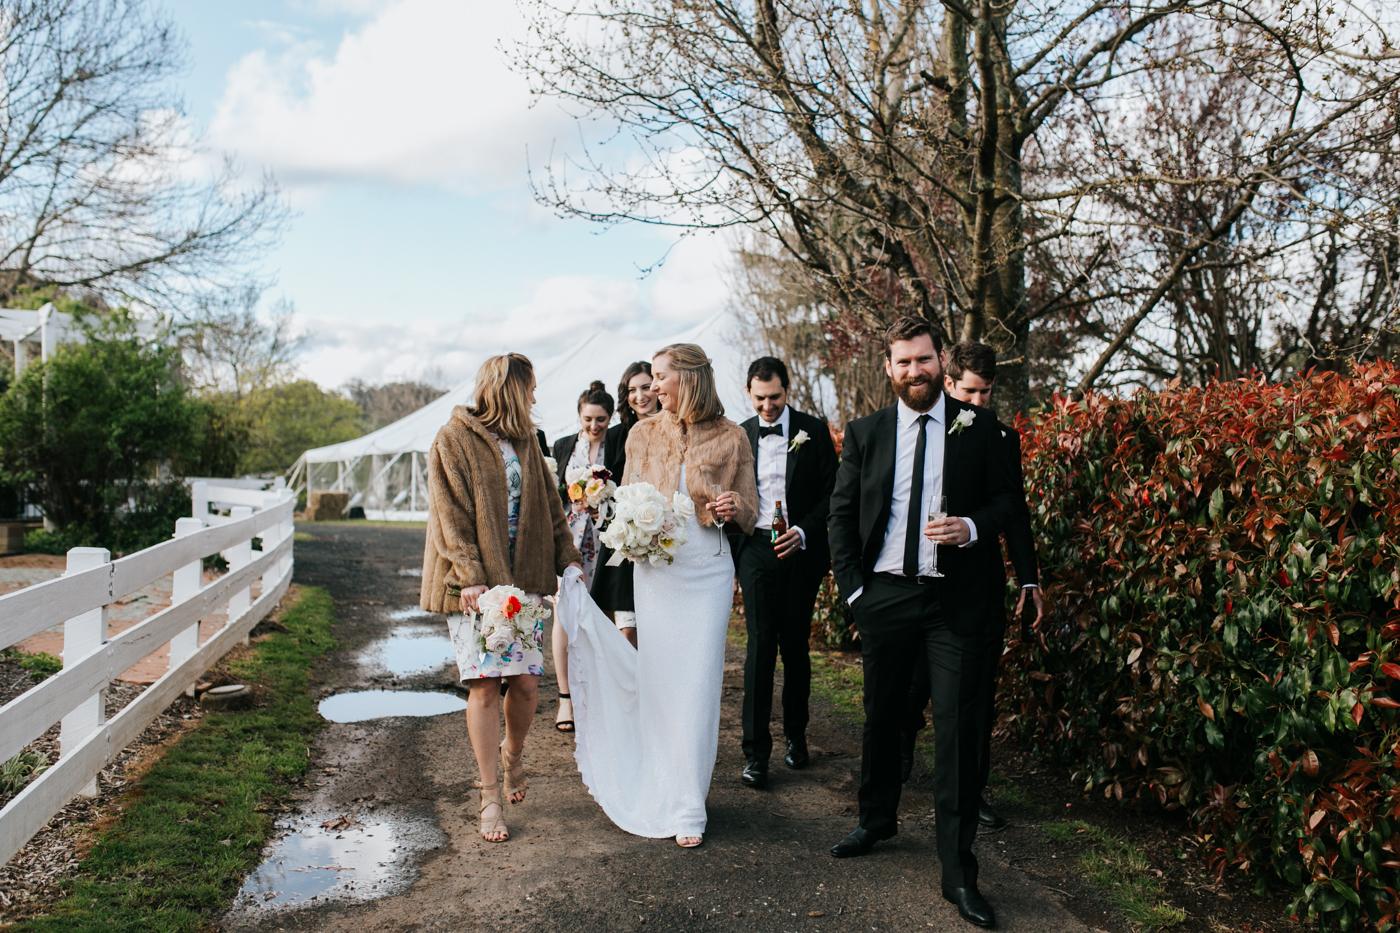 Bridget & James - Orange Country Wedding - Samantha Heather Photography-95.jpg